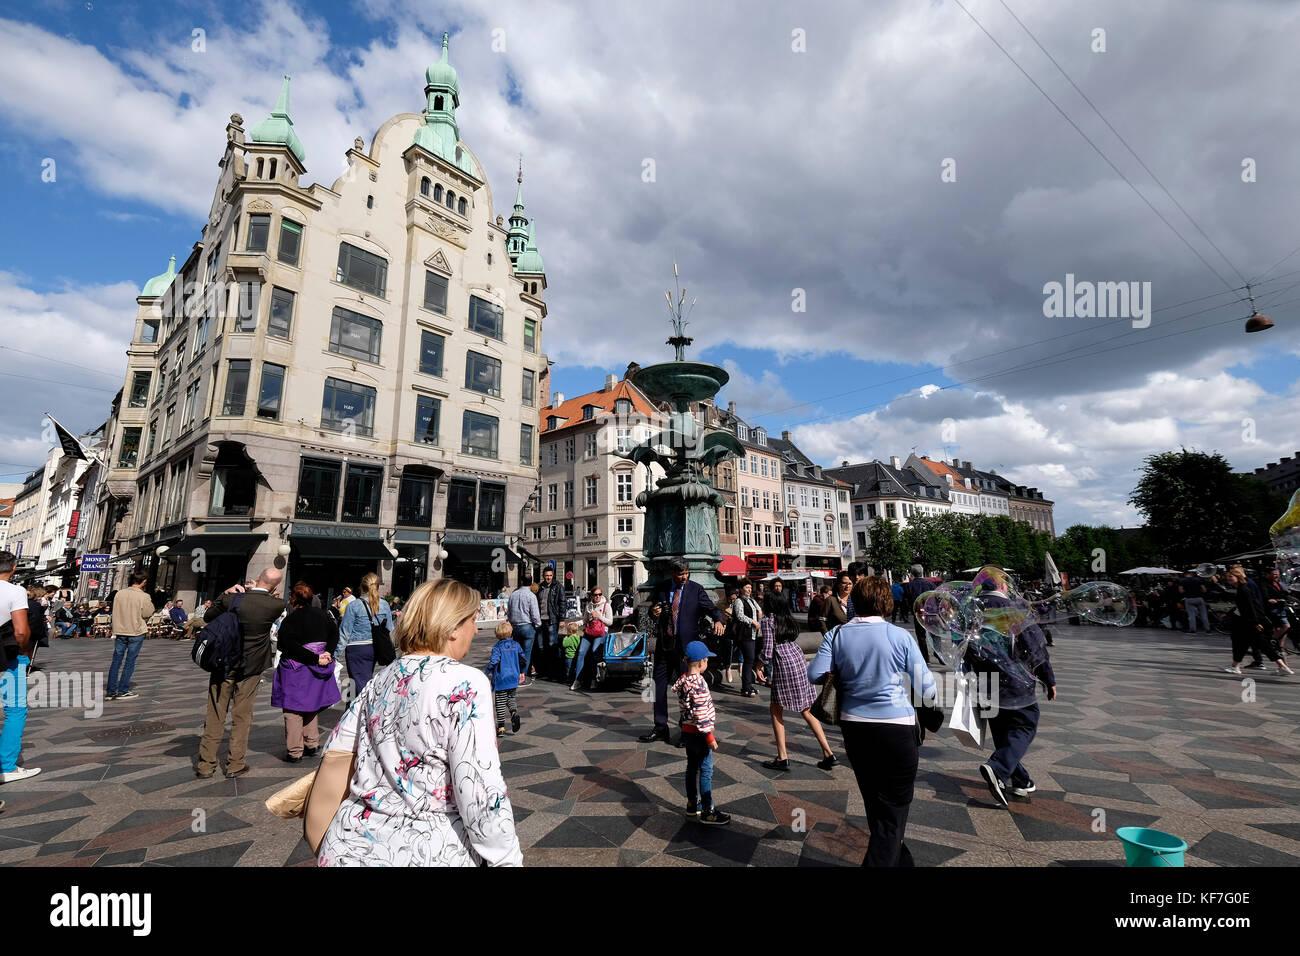 Denmark, Copenhagen, Stroget, Pedestrian street, Amagertorv - Stock Image